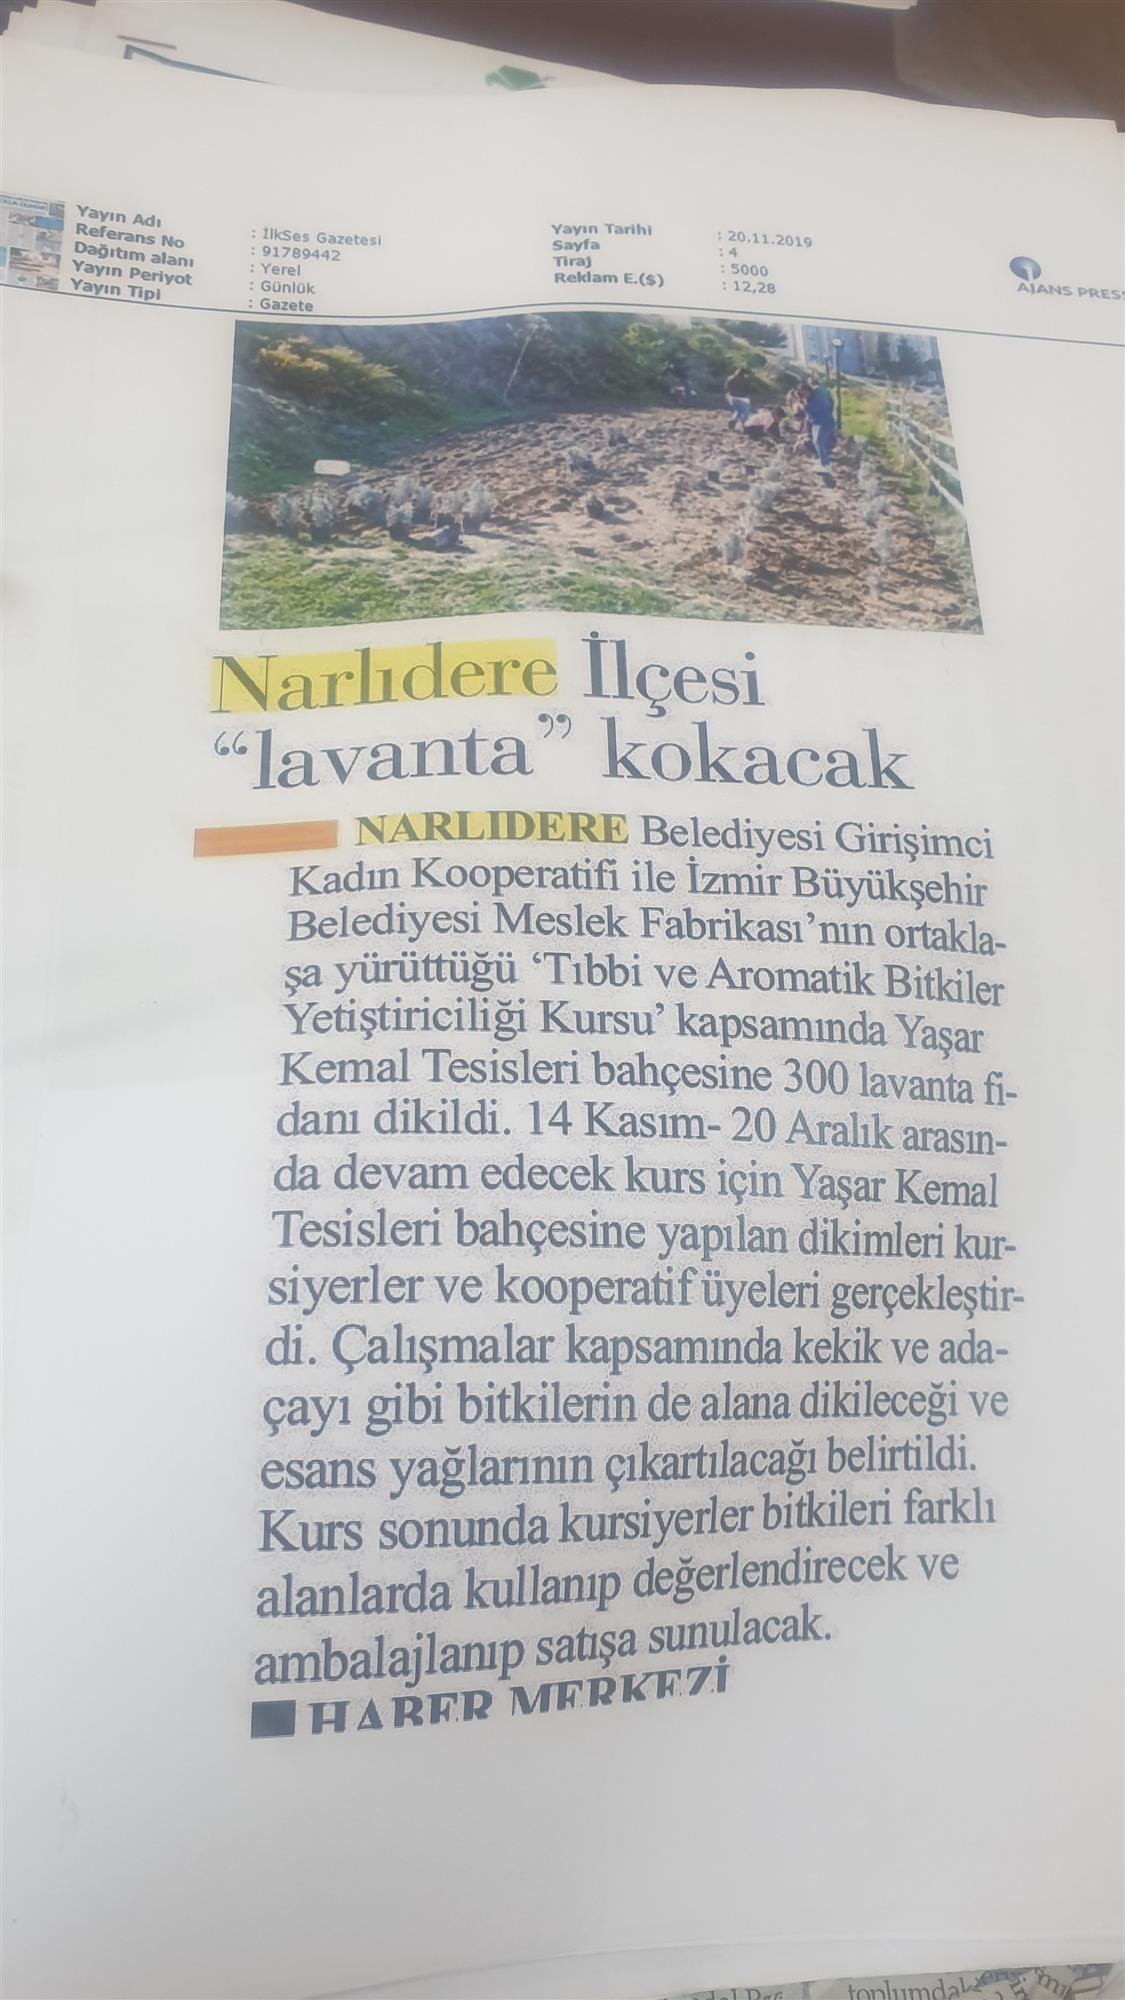 gazete-haberleri202012816614123